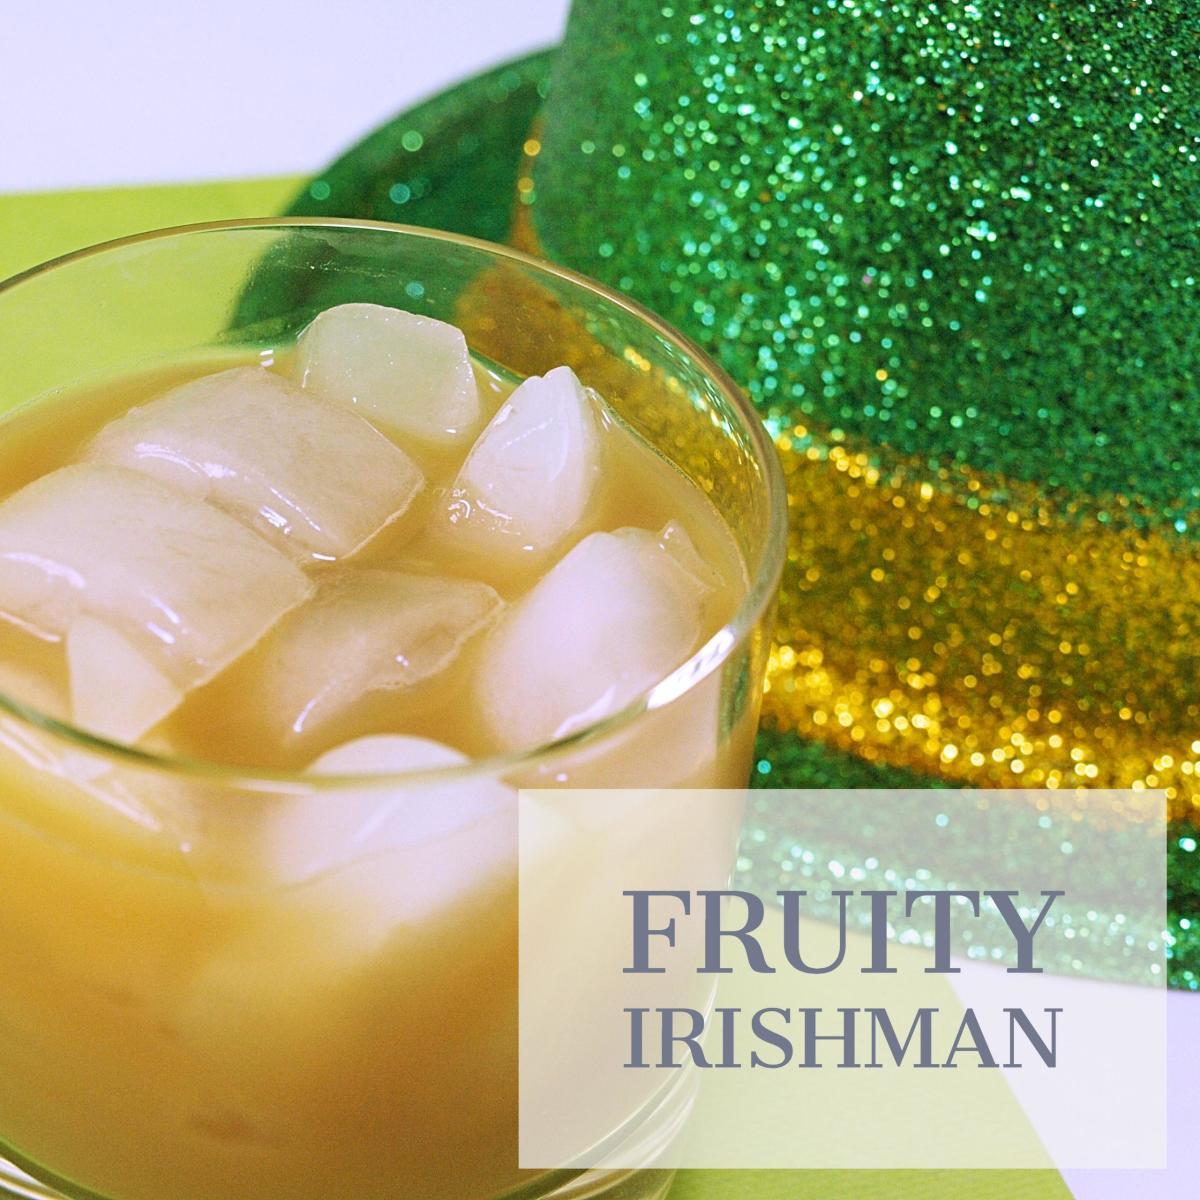 Fruity Irishman